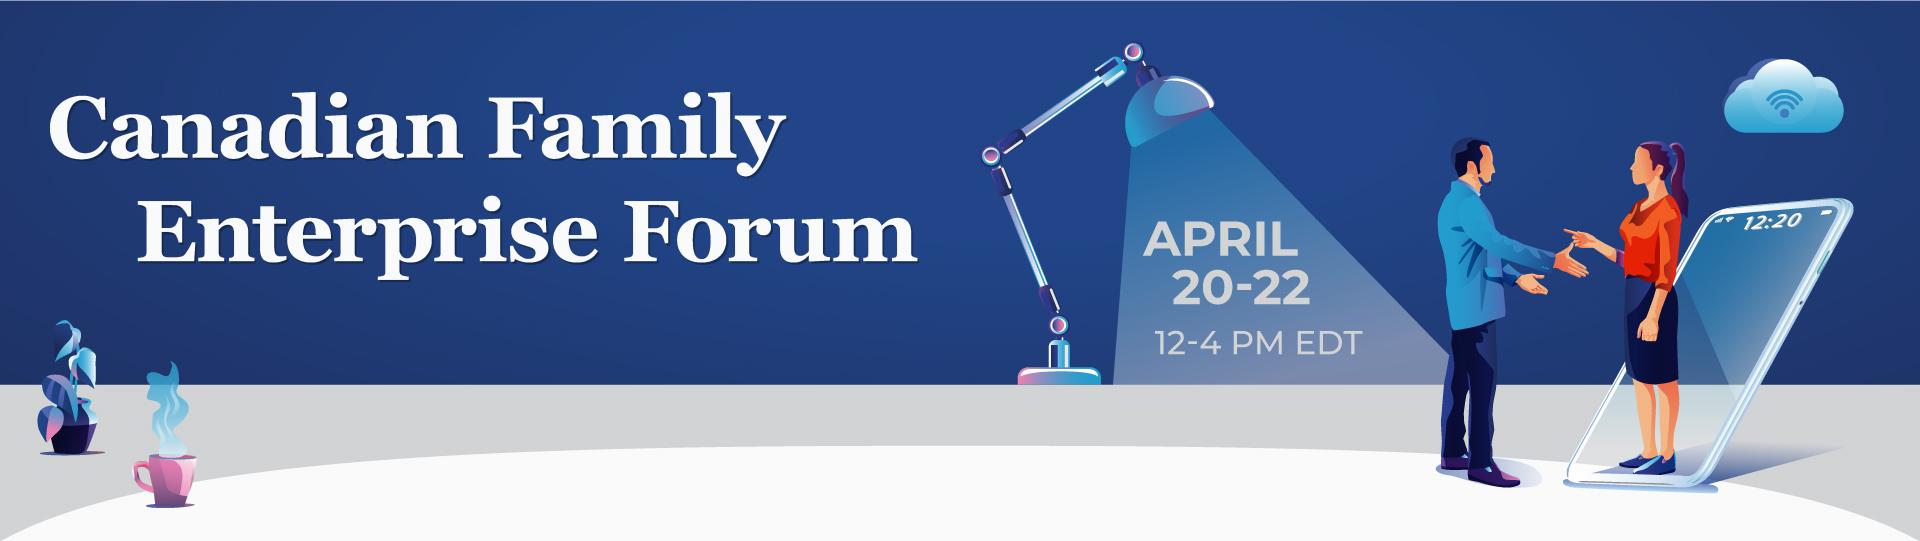 Canadian-Family-Enterprise-Forum-Website-Hero-Image